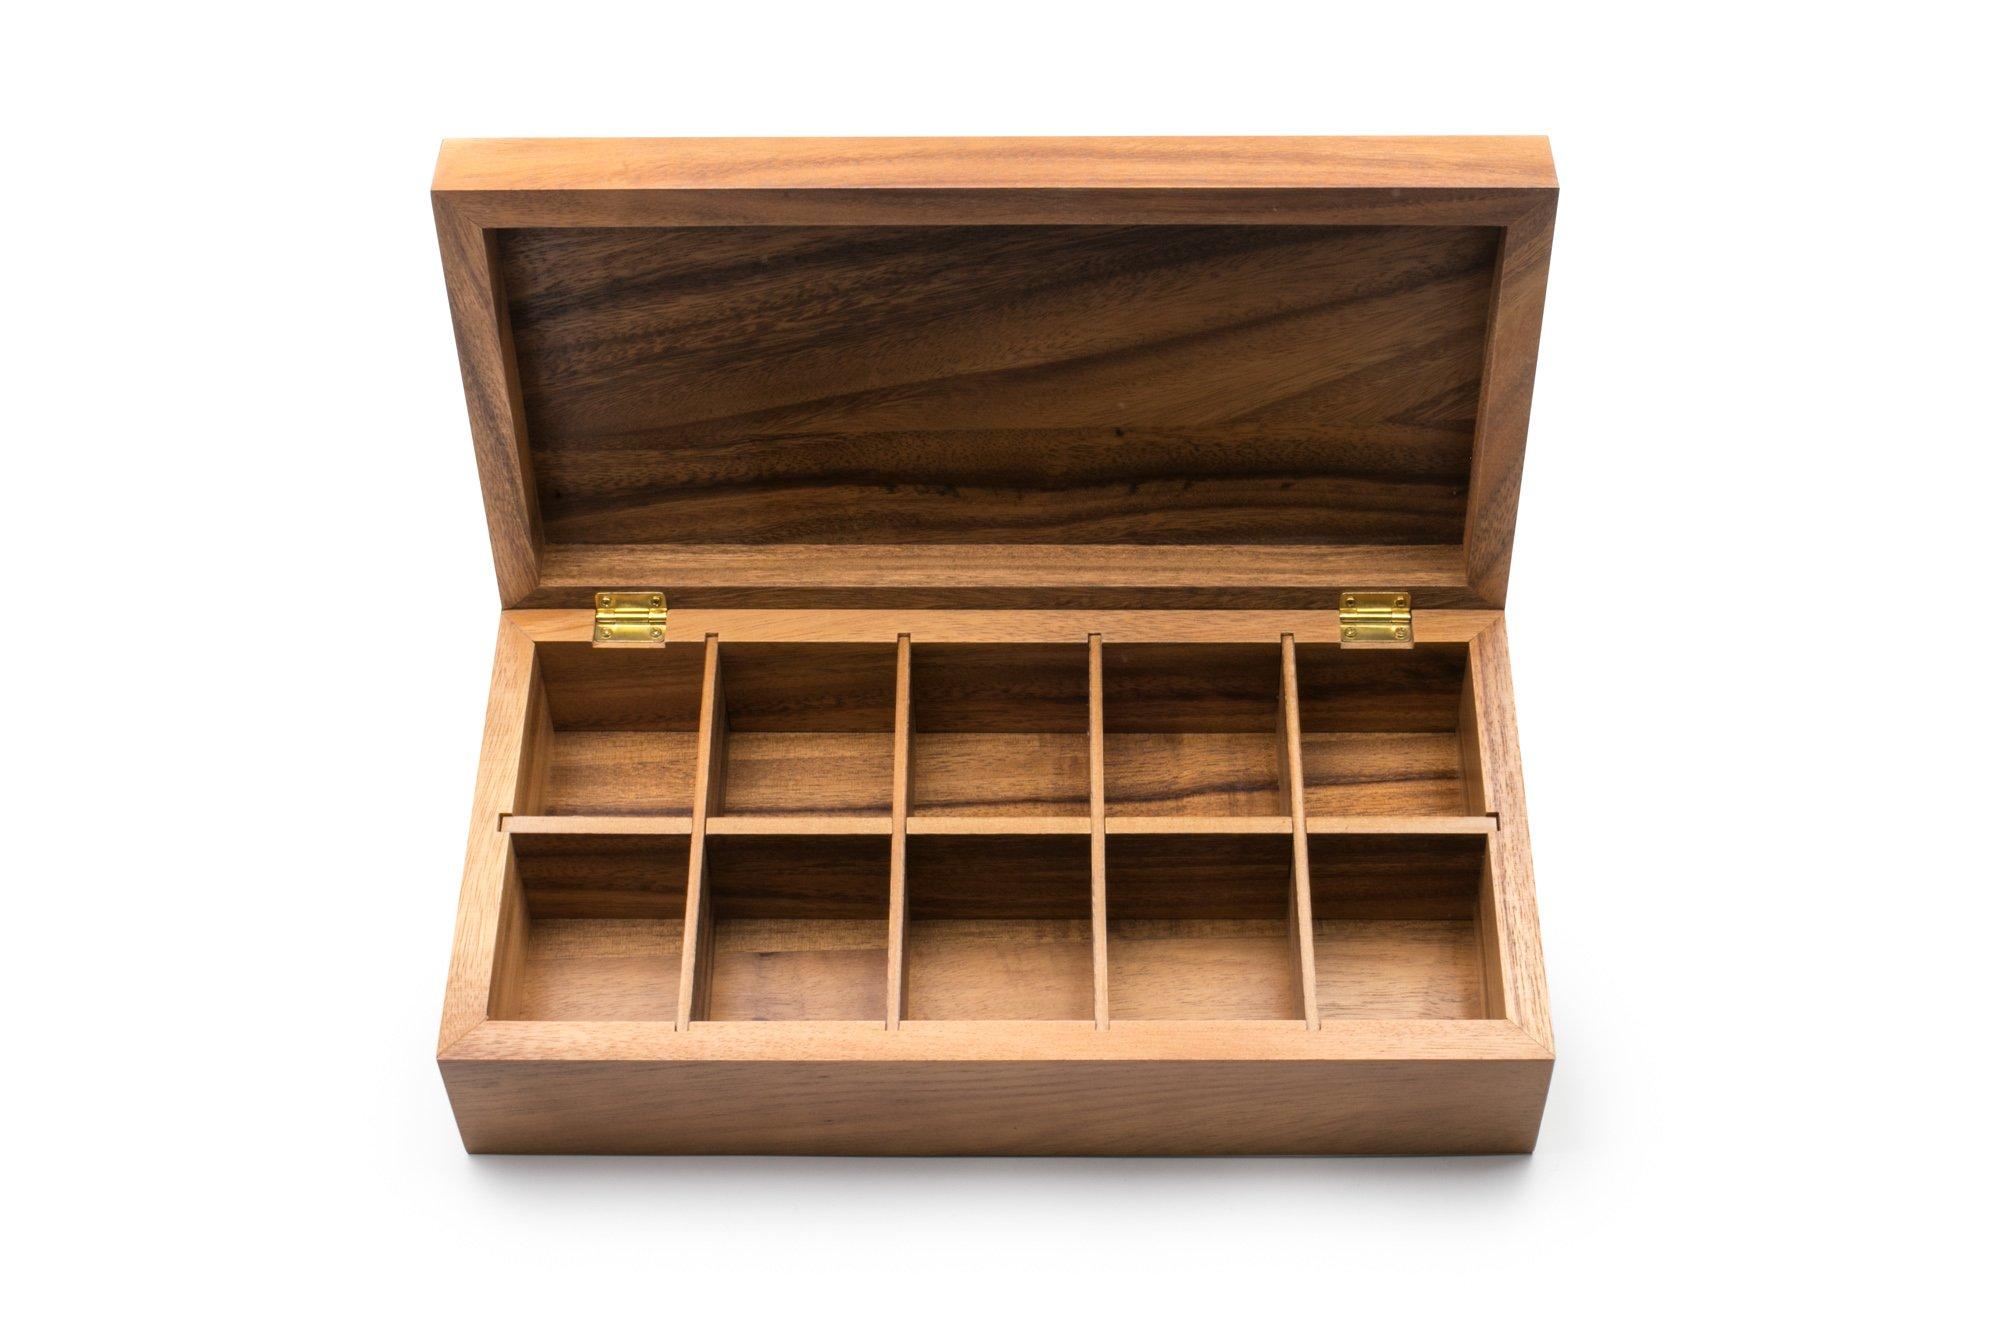 Ironwood Gourmet 28142 Rectangular Vauxhall Double Tea Box, Acacia Wood by Ironwood Gourmet (Image #2)